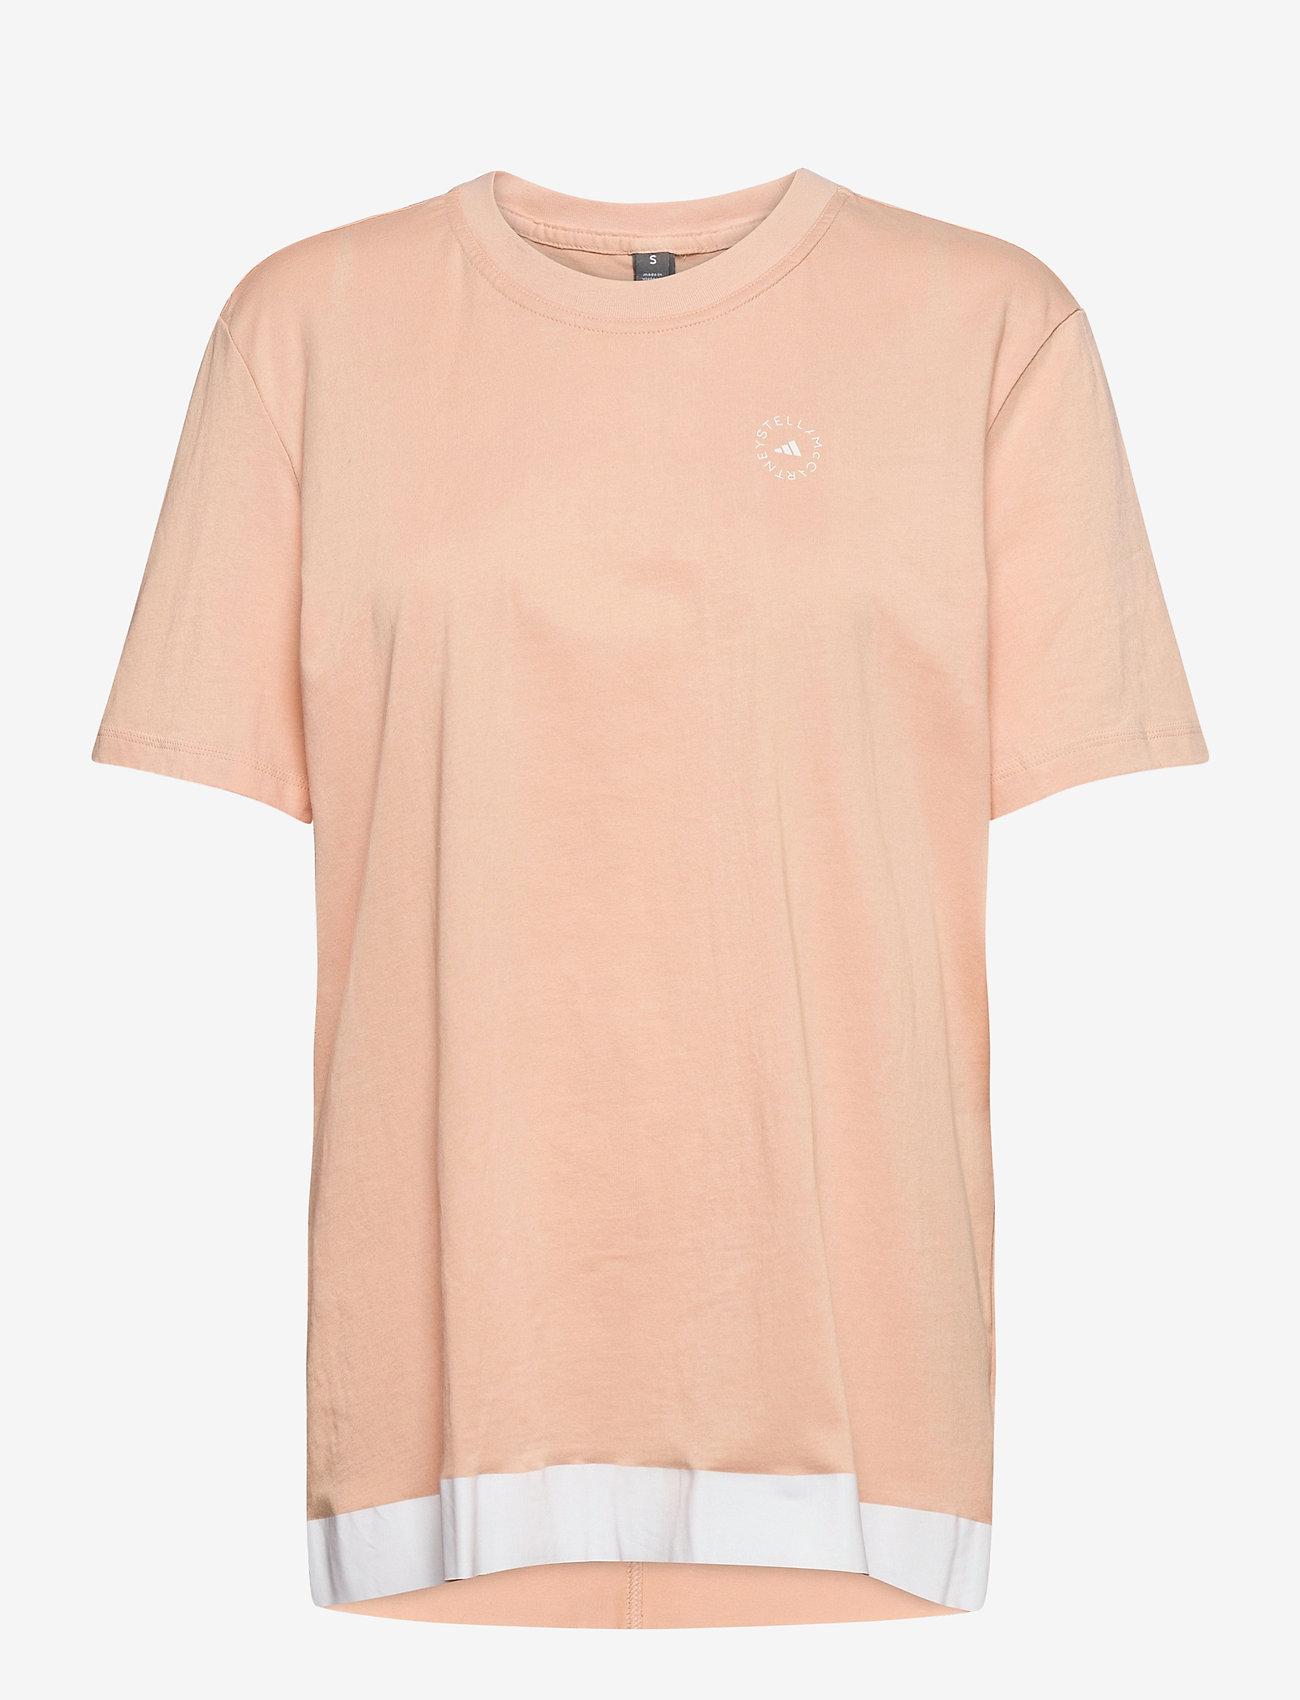 adidas by Stella McCartney - COTTON TEE - t-shirts - sofpow - 0